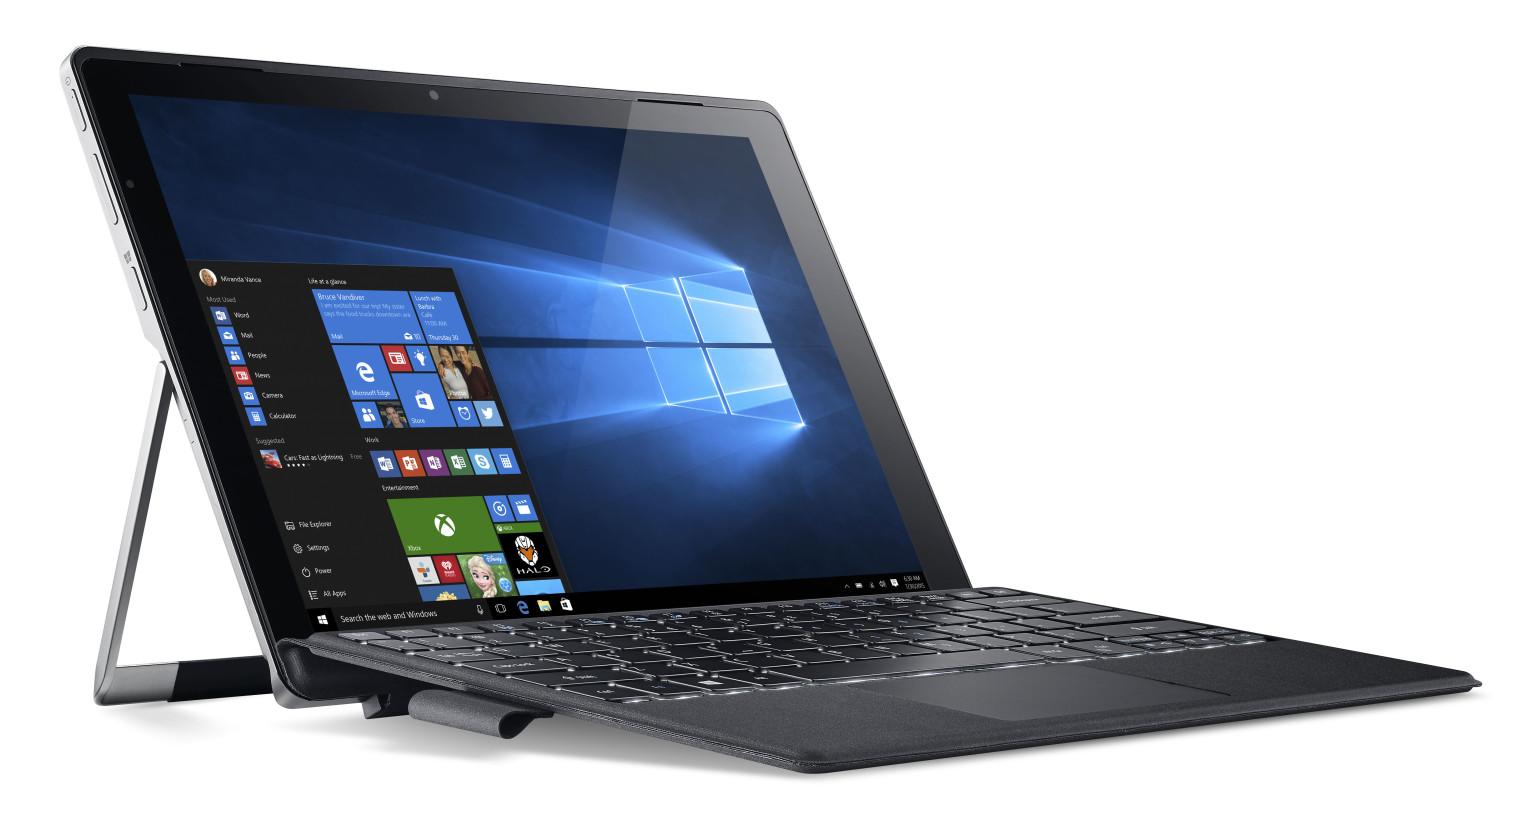 Планшет Acer Switch Alpha 12 SA5-271-71P3 NT.LCDER.016 (Intel Core i7-6500U 2.5 GHz/8192Mb/256Gb SSD/Wi-Fi/Bluetooth/Cam/12/2160x1440/Windows 10 64-bit)